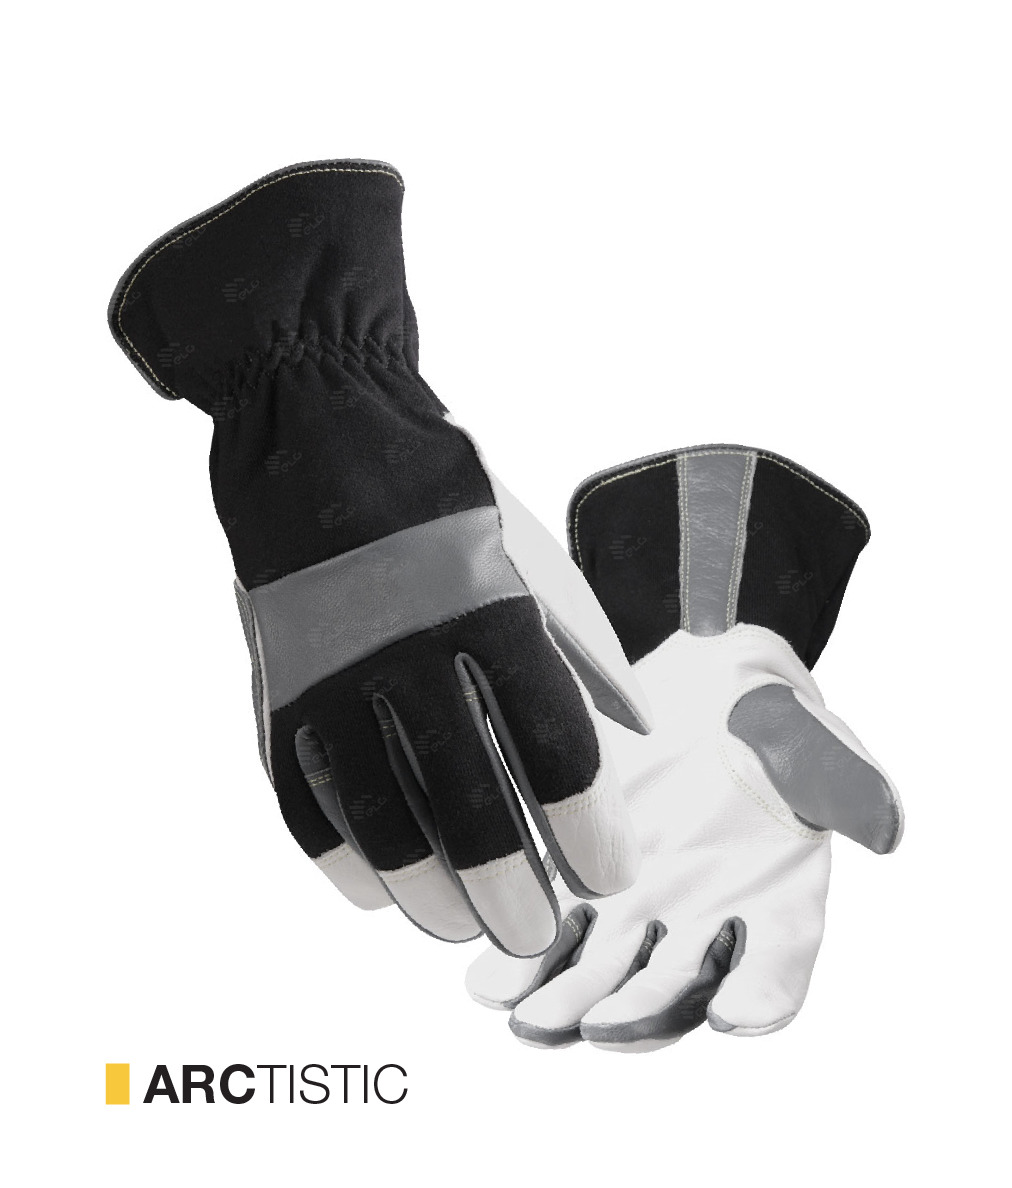 ARCTISTICS cut-resistant gloves by elite leather